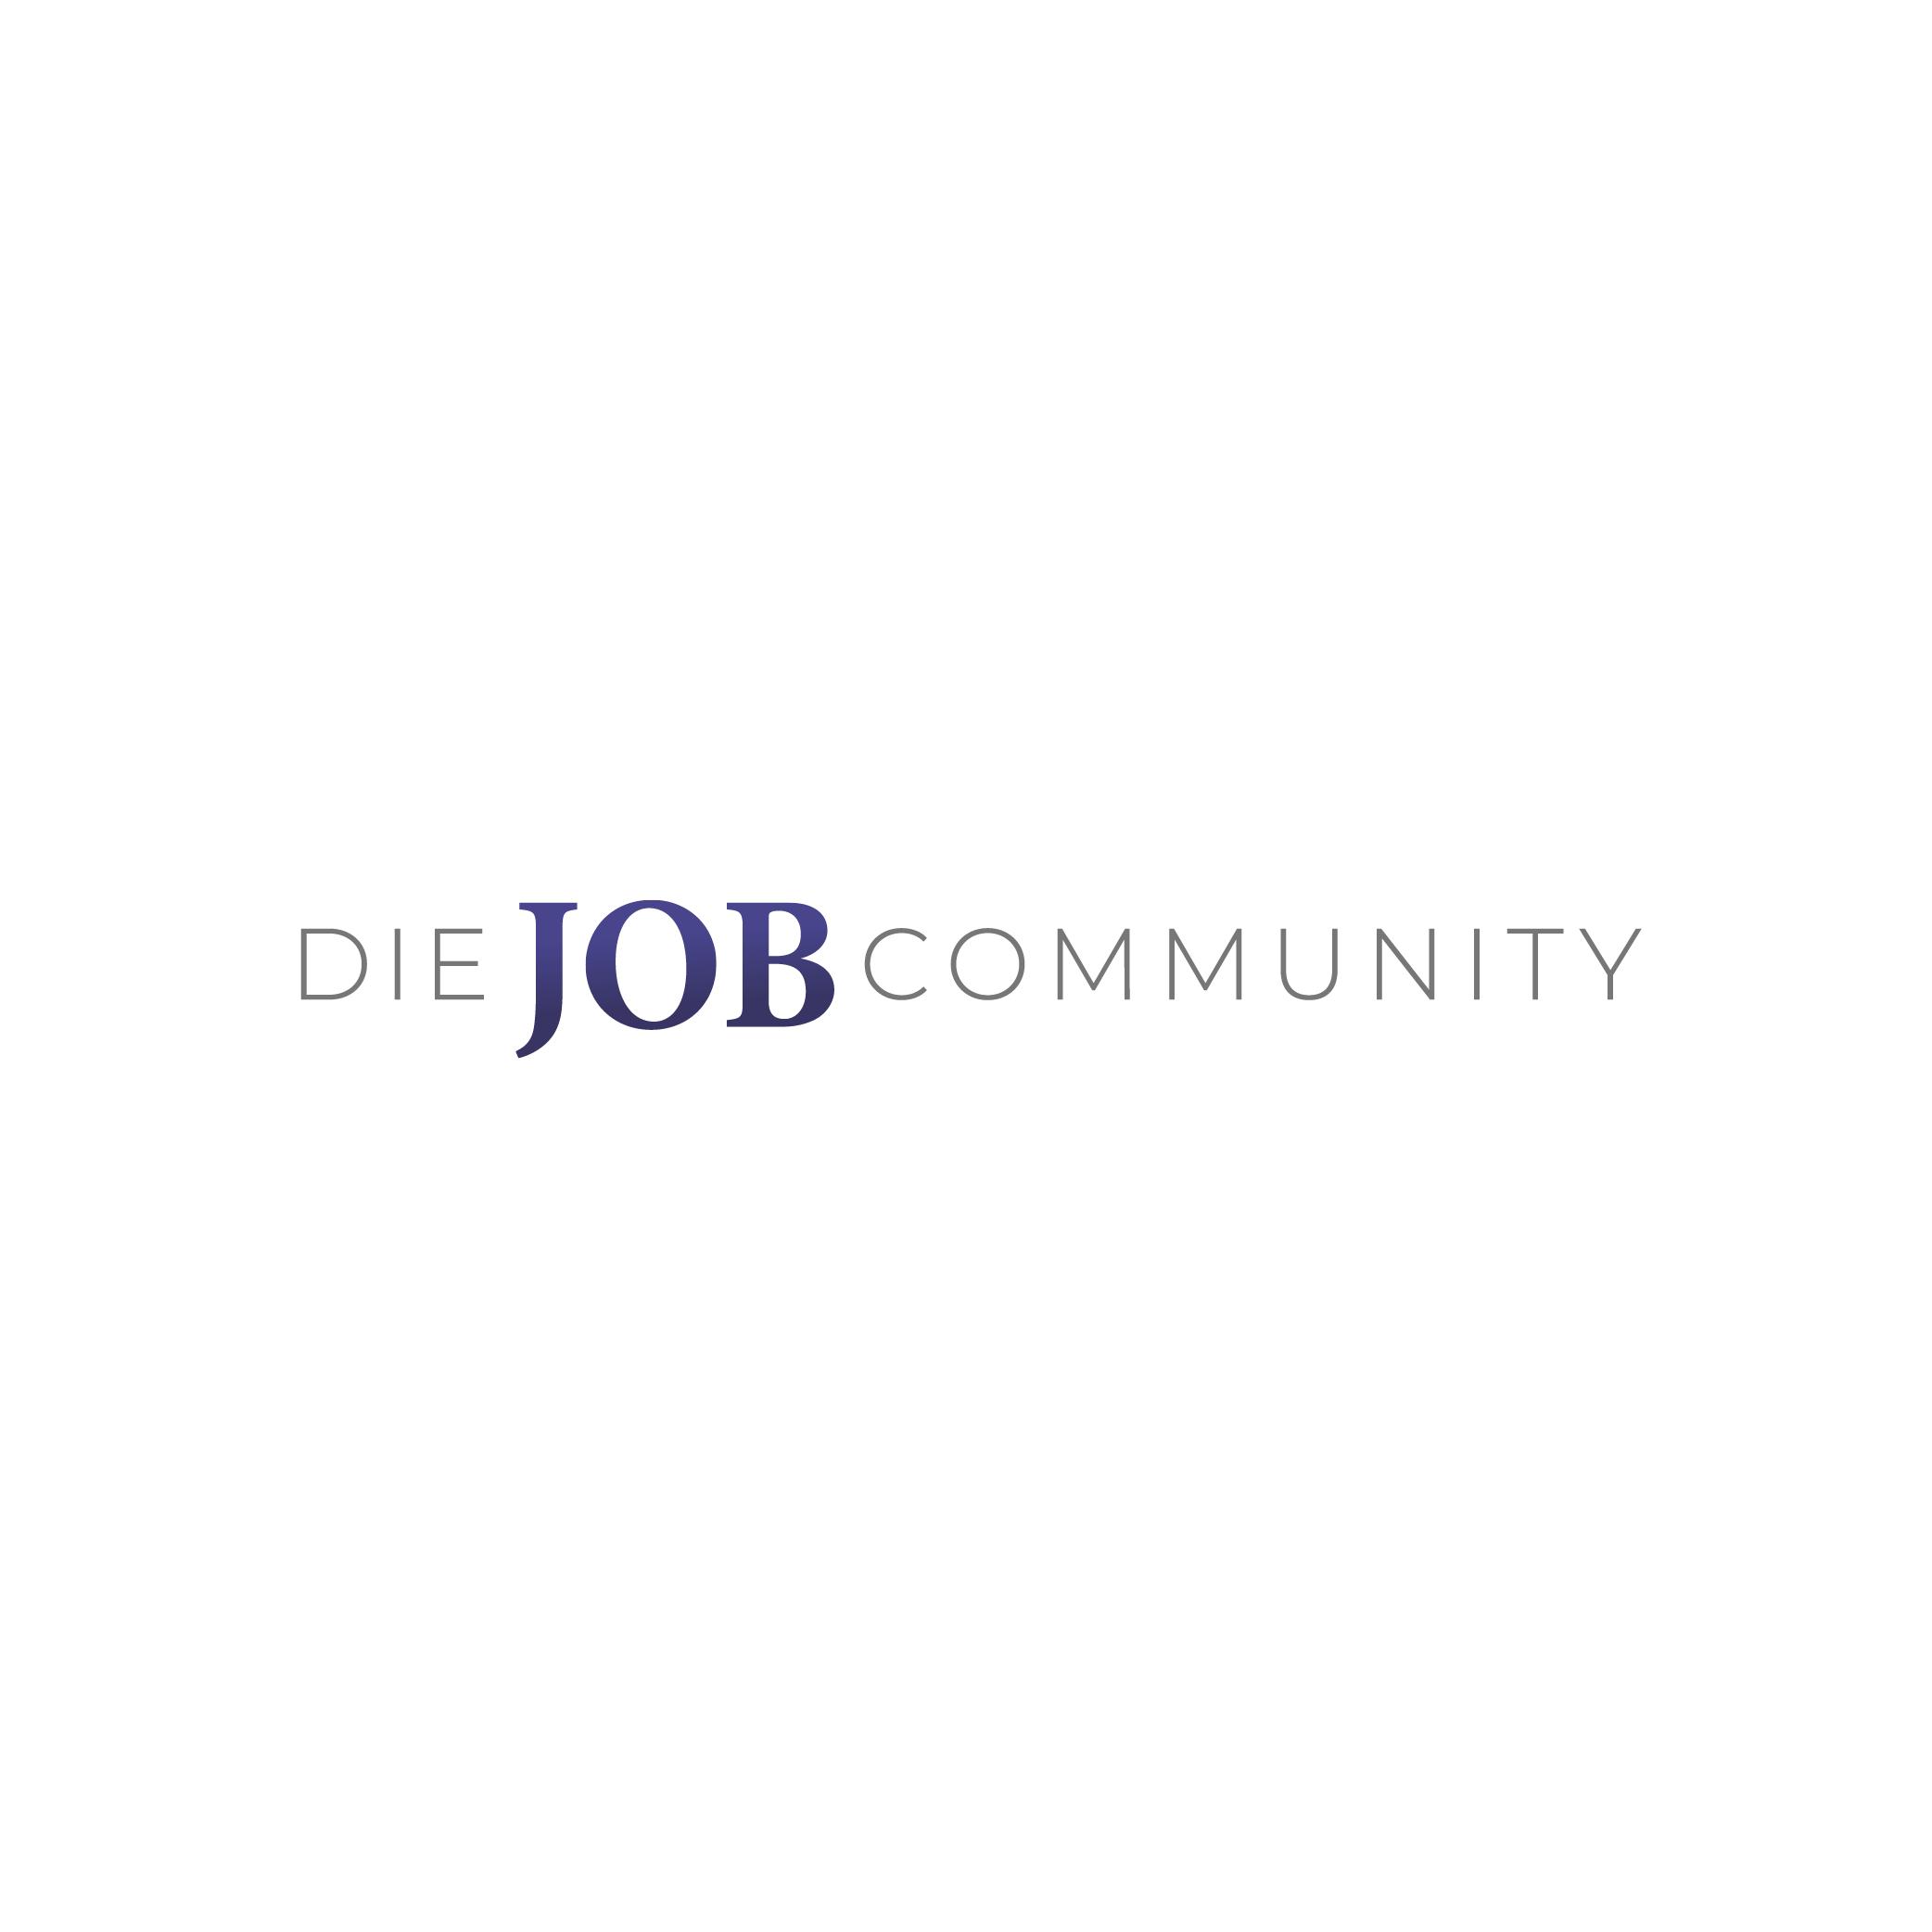 Job Community